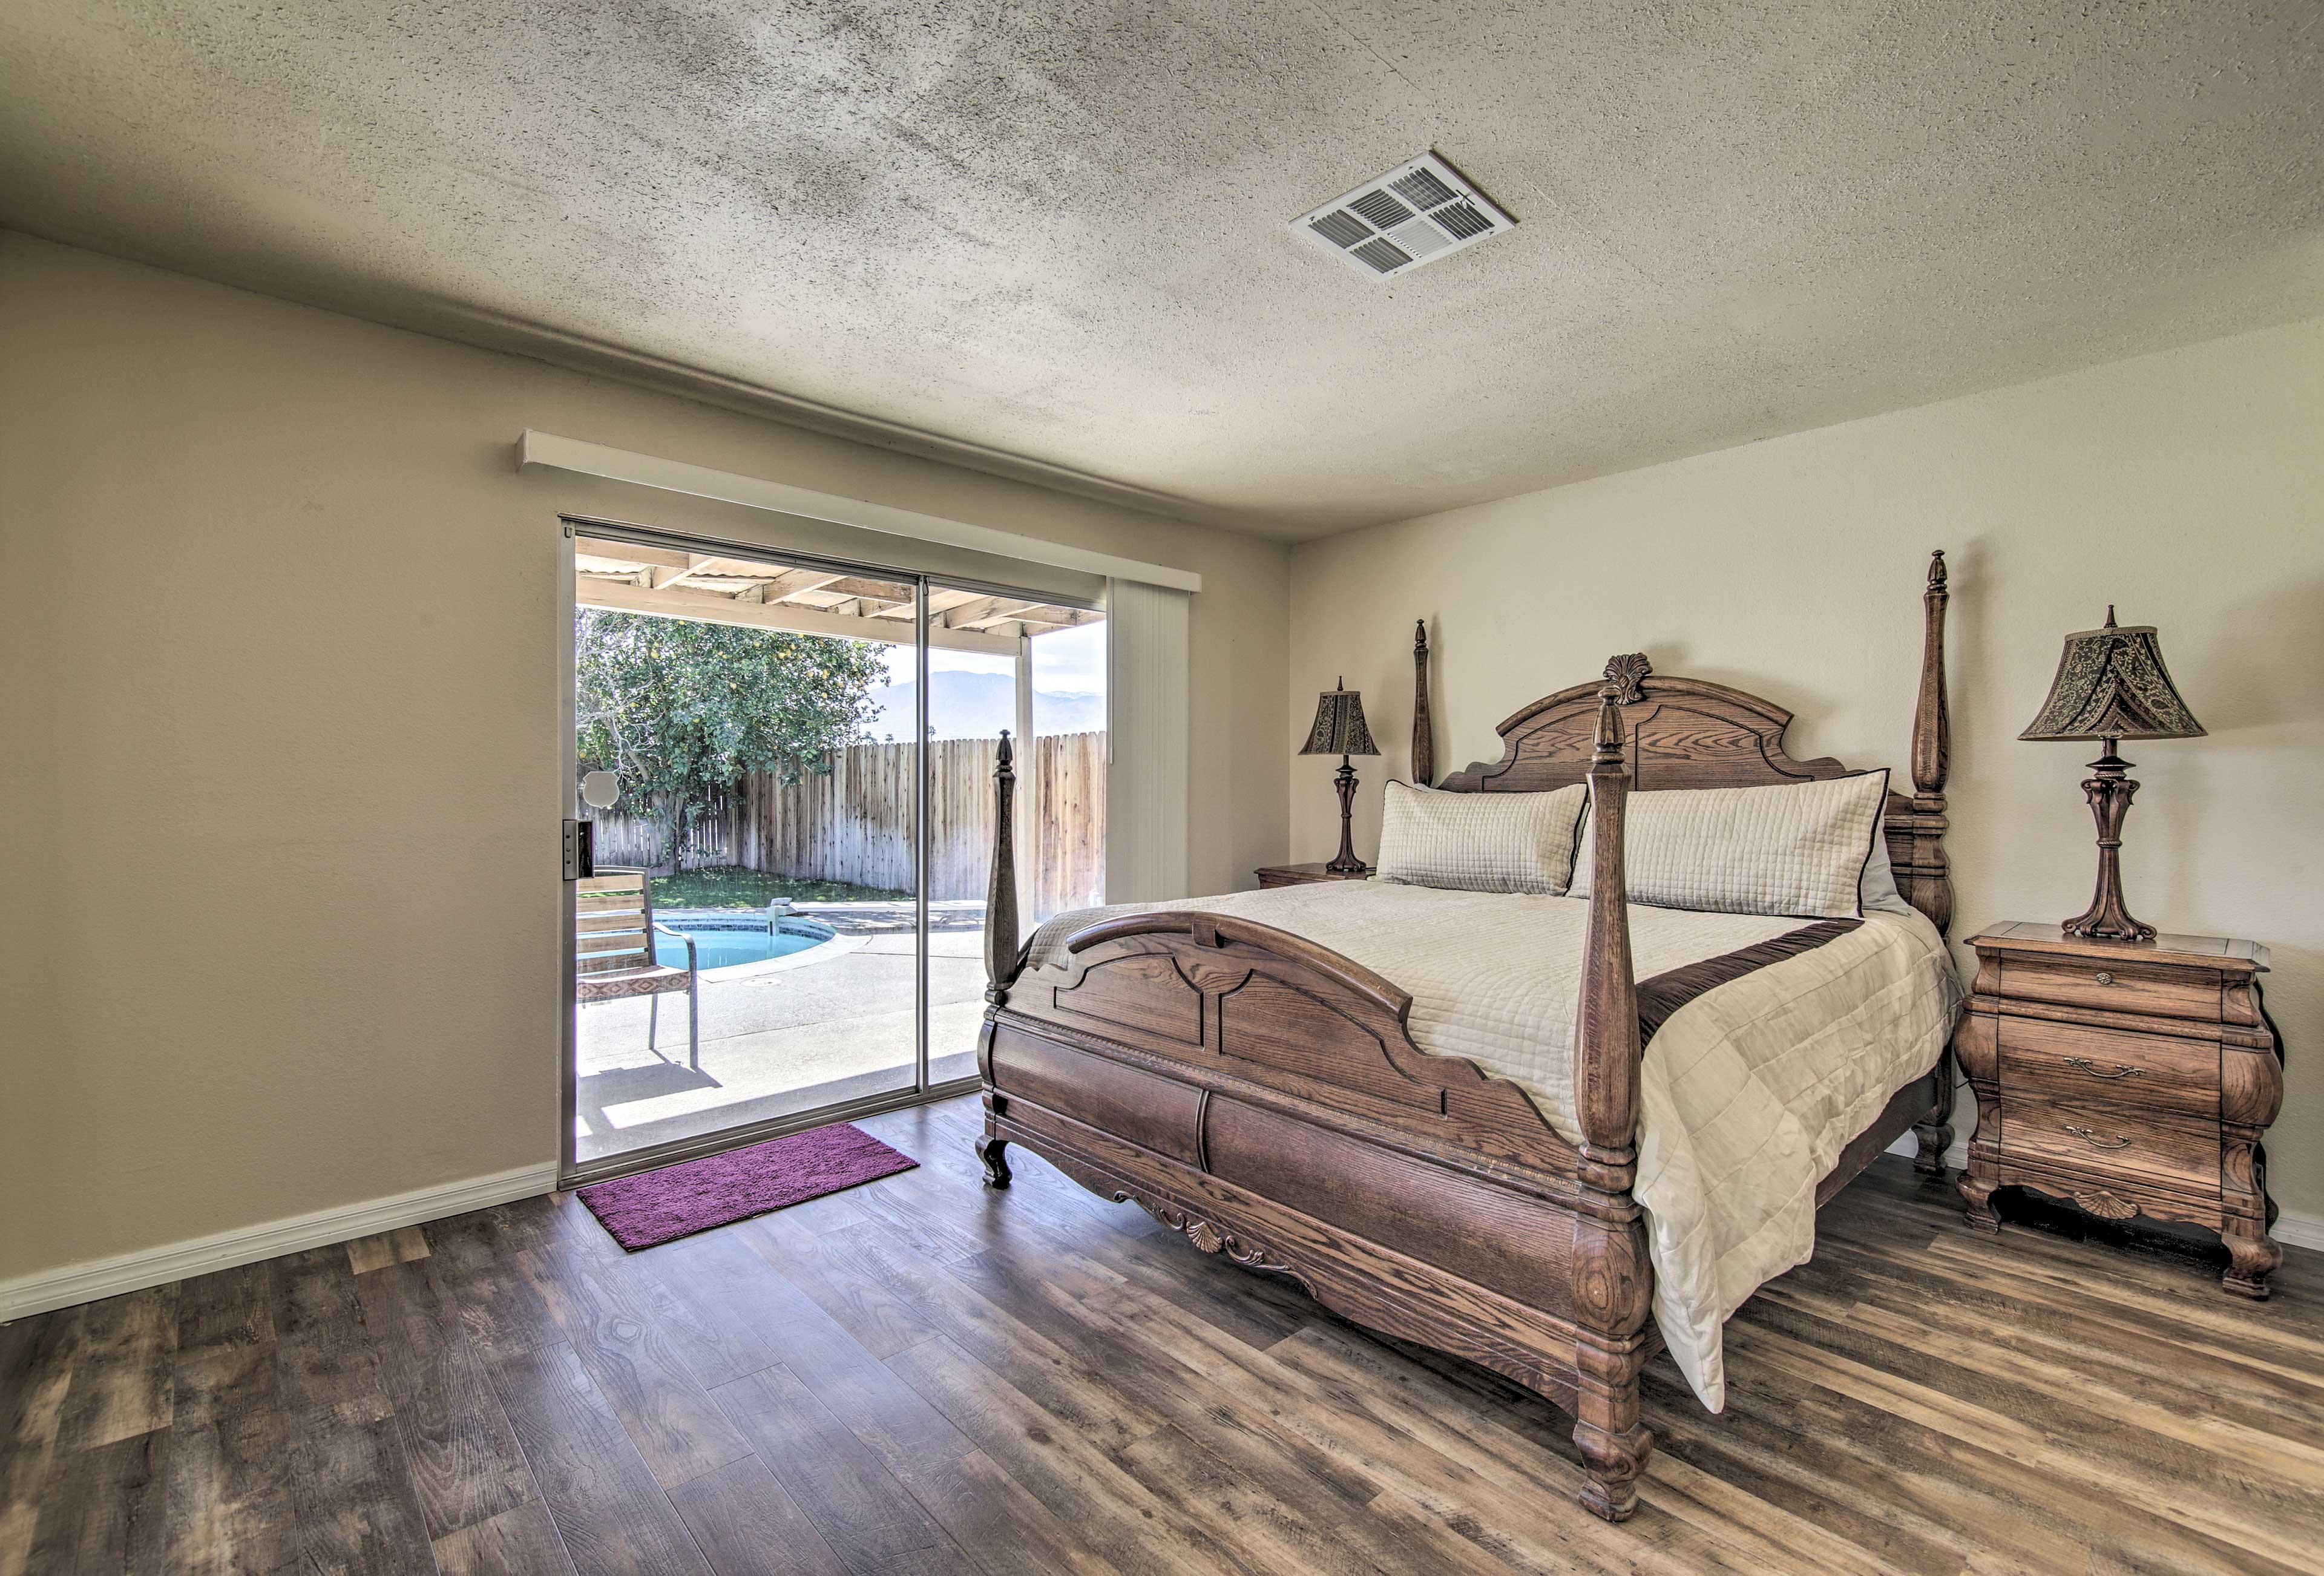 The master bedroom boasts an impressive California king bed.